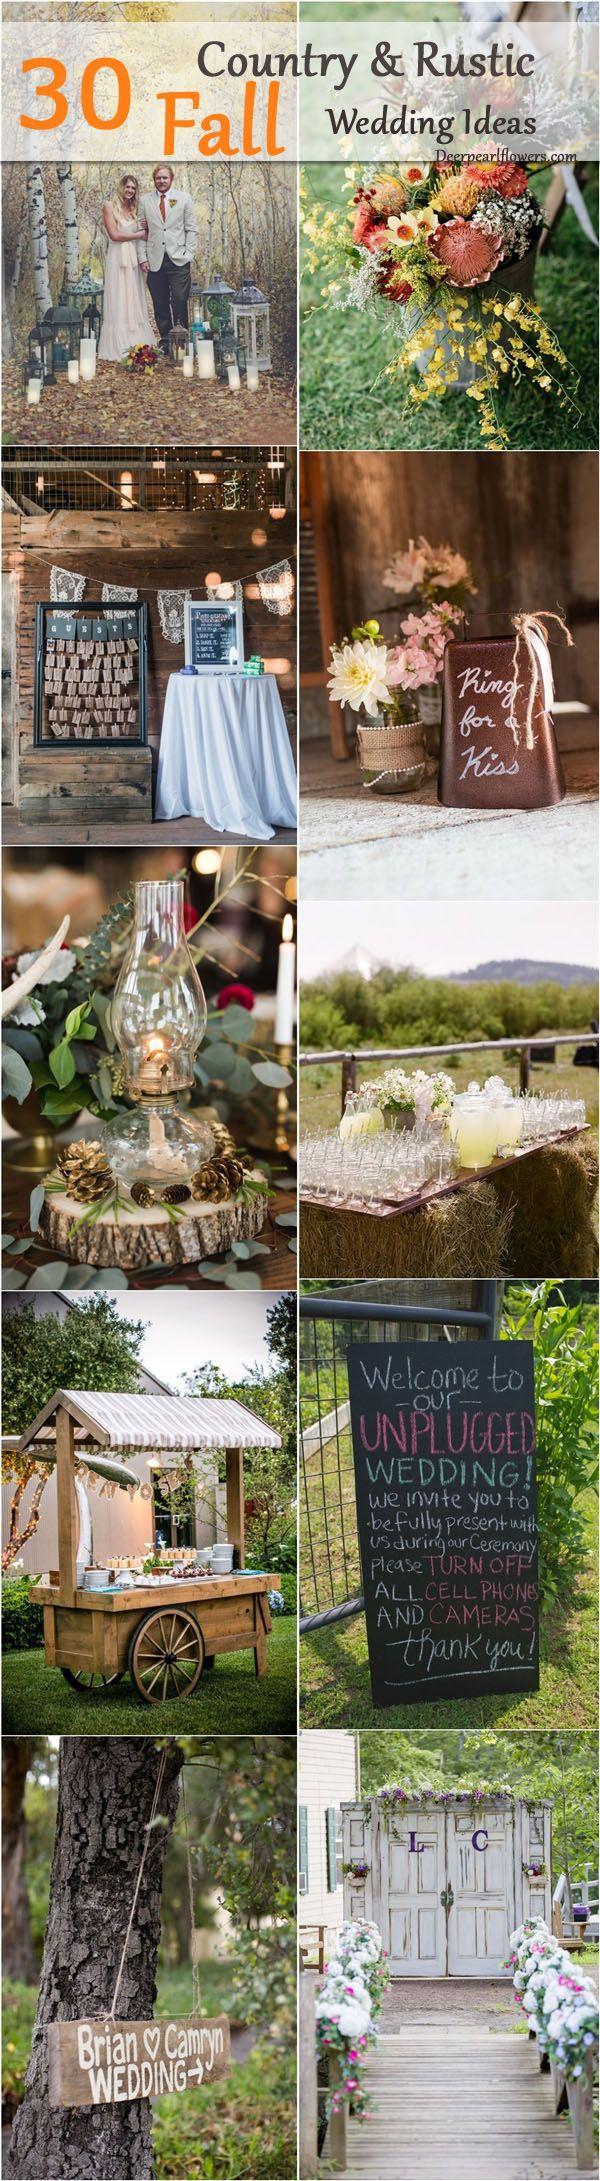 Outdoor fall wedding decor   Fall u Country Rustic Wedding Theme Ideasu  Signs and ideas